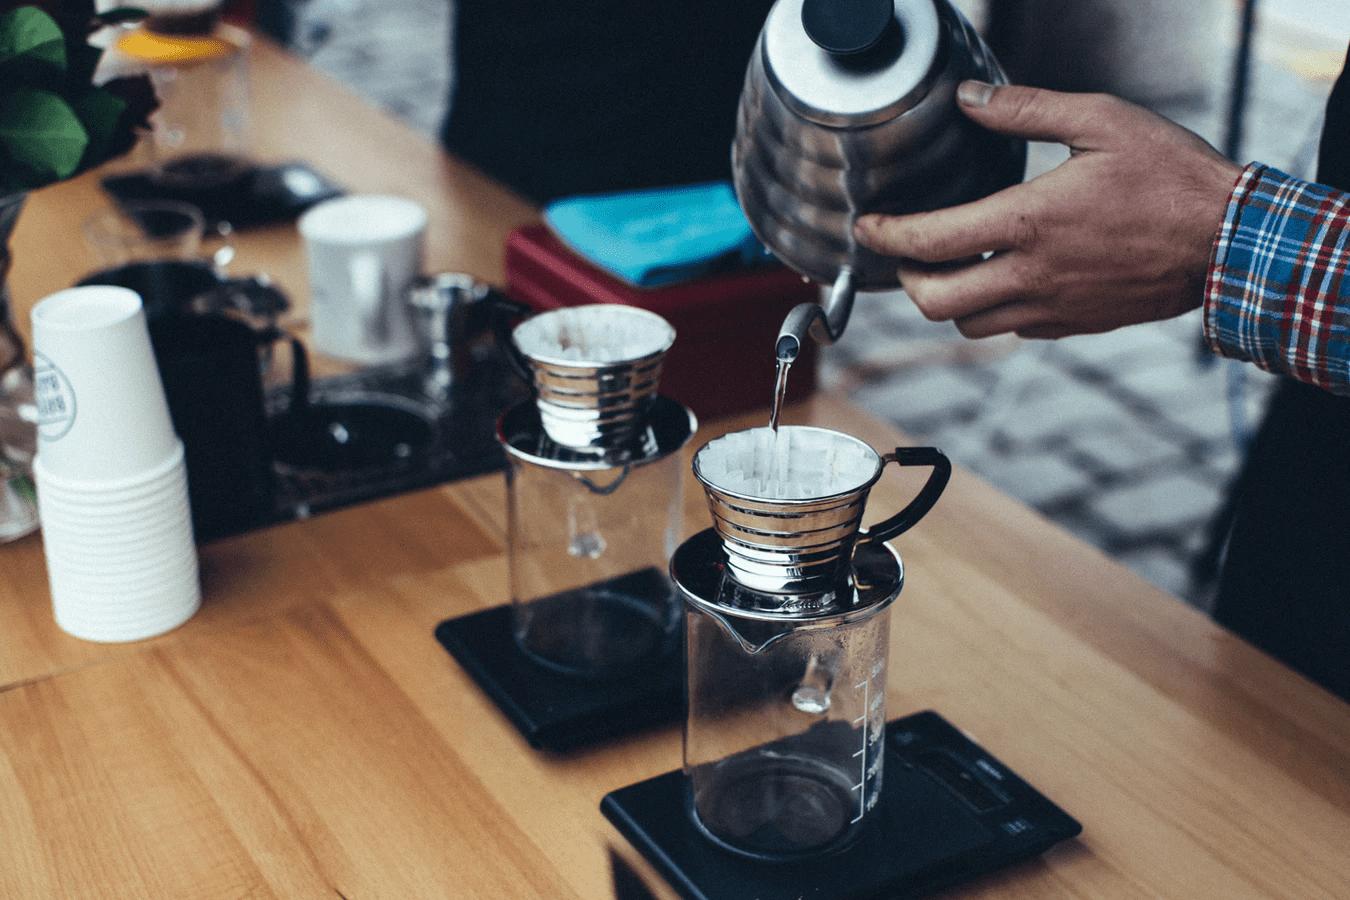 Barista preparing a hot drink